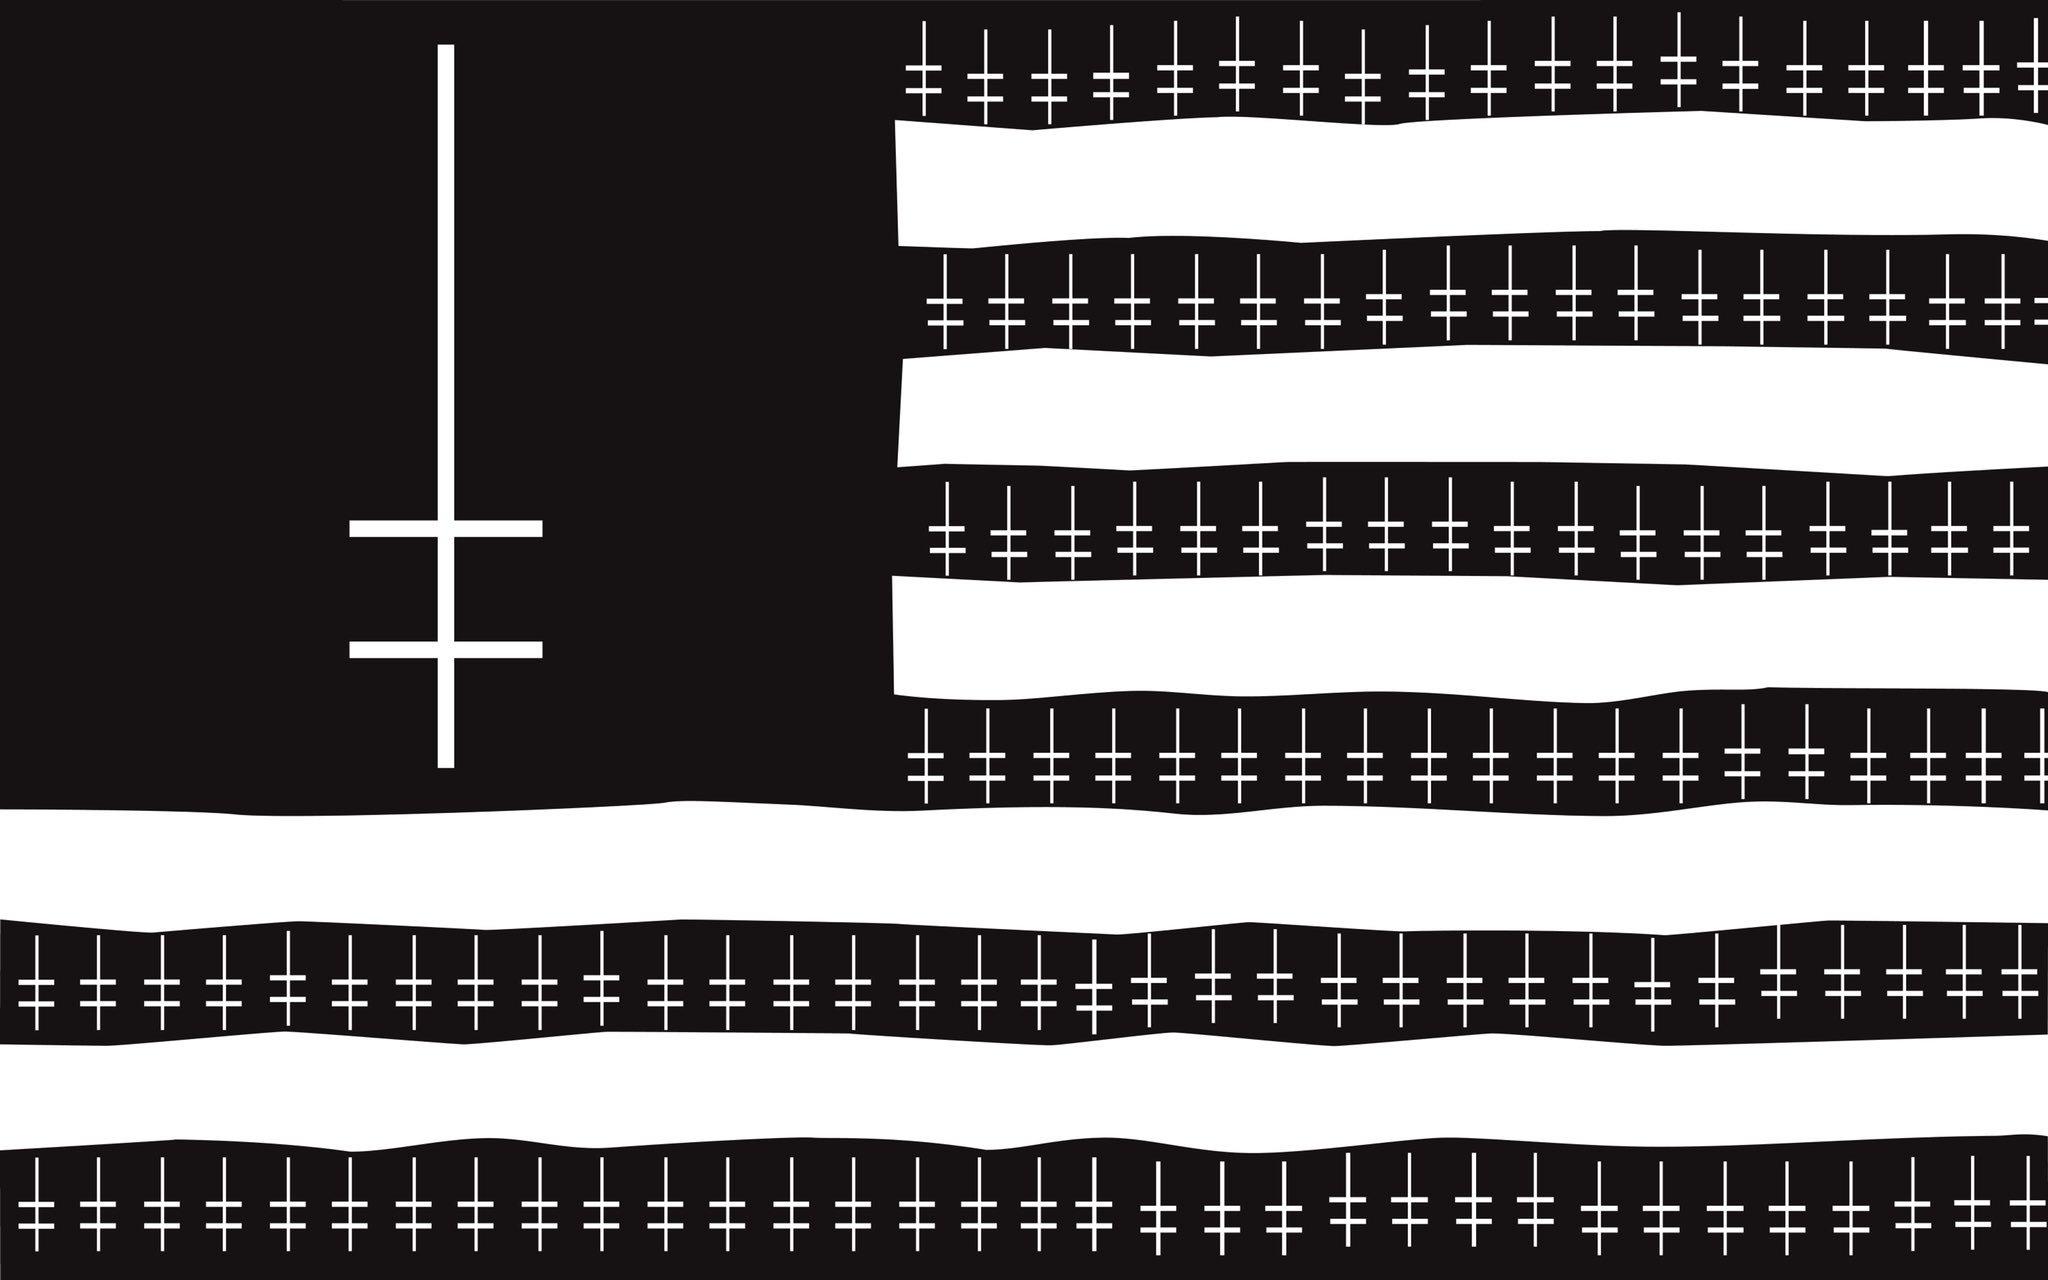 Wallpaper Marilyn Manson Music Flag Parody 2048x1280